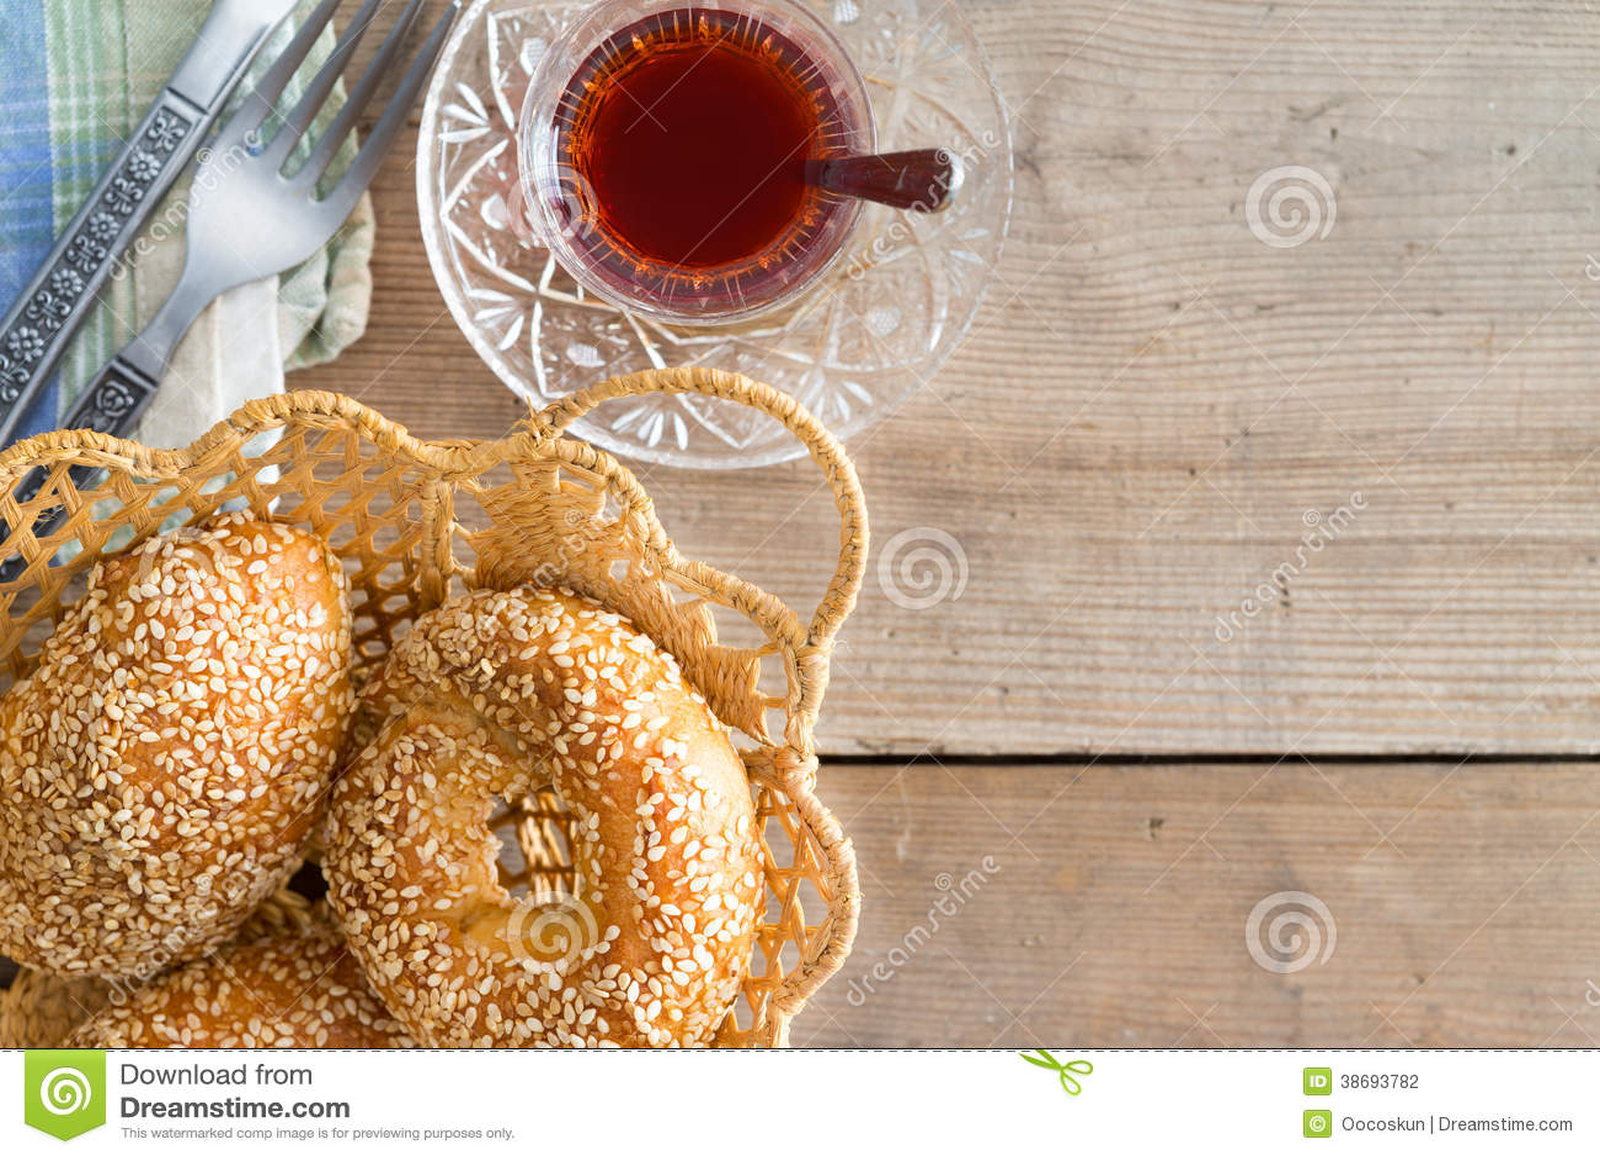 Bagel turchi del sesamo e del tè